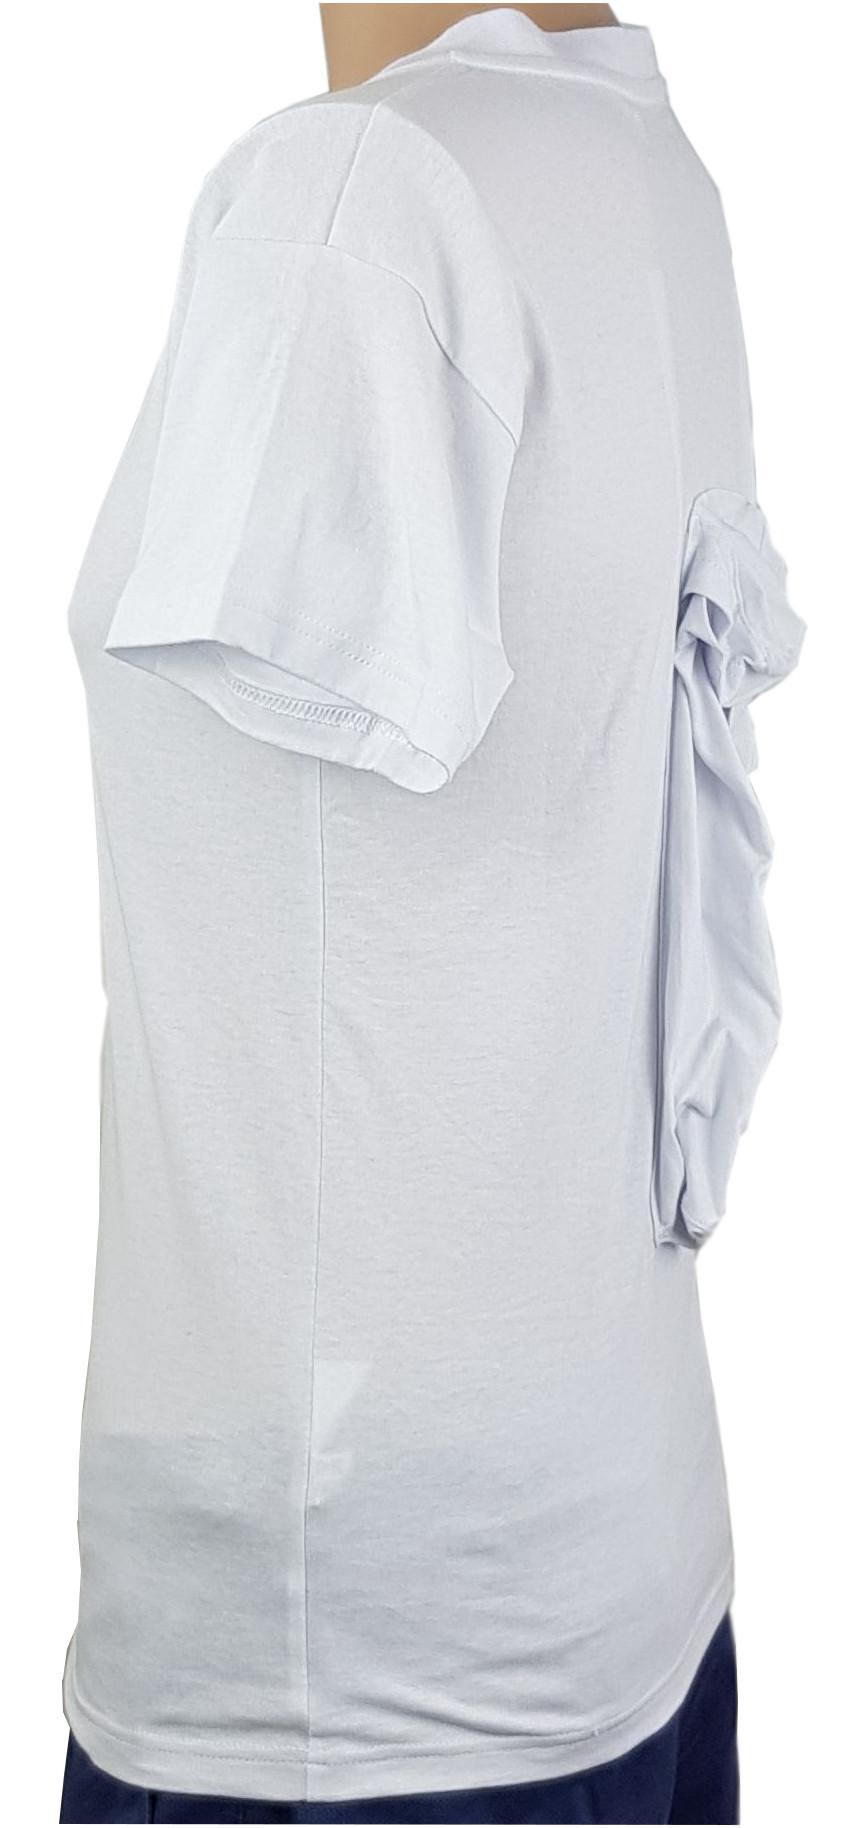 RVS-Ersatzshirt WK1